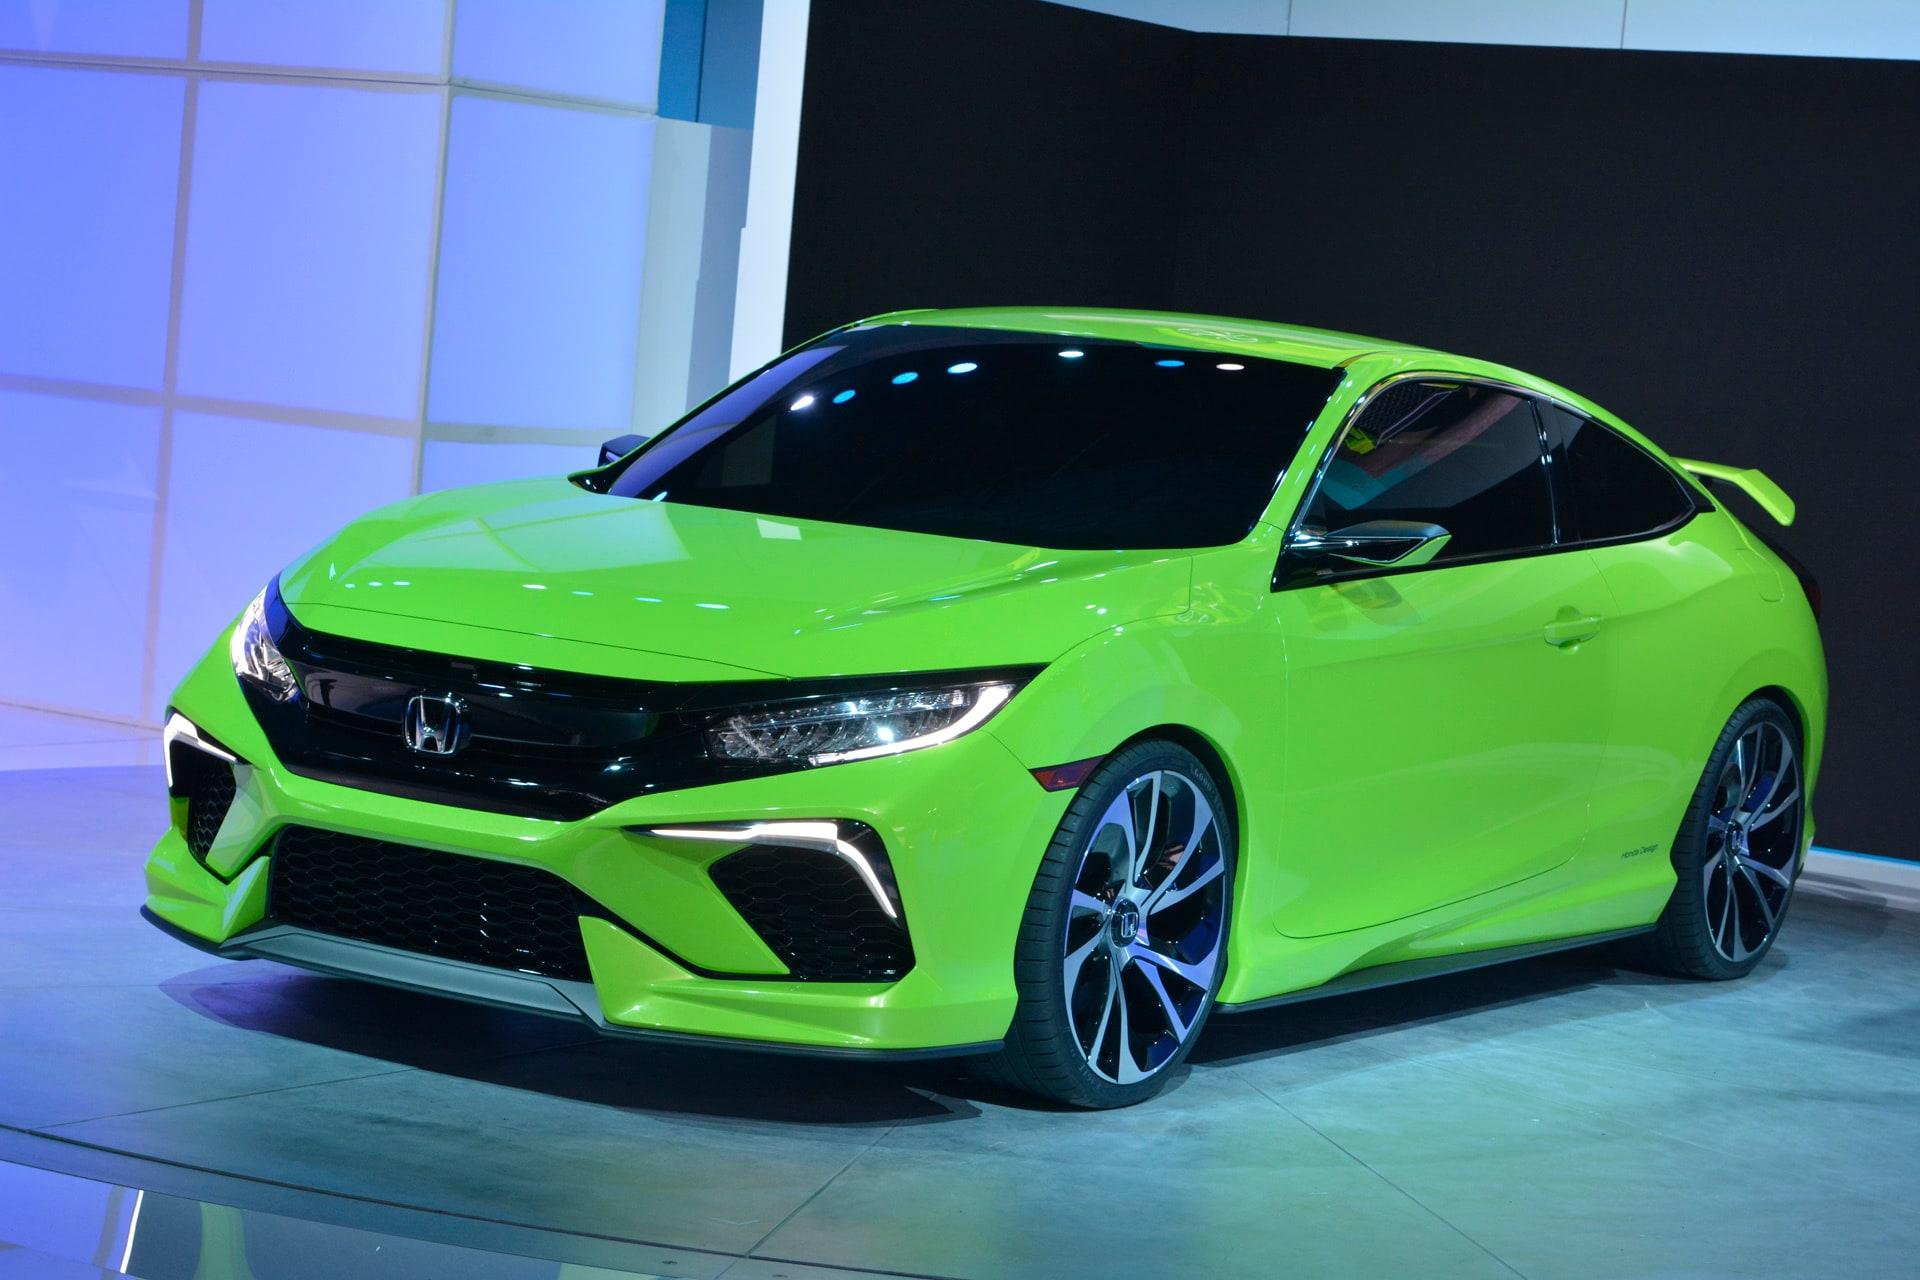 Greenwich Honda | New Honda dealership in Greenwich, CT 06830